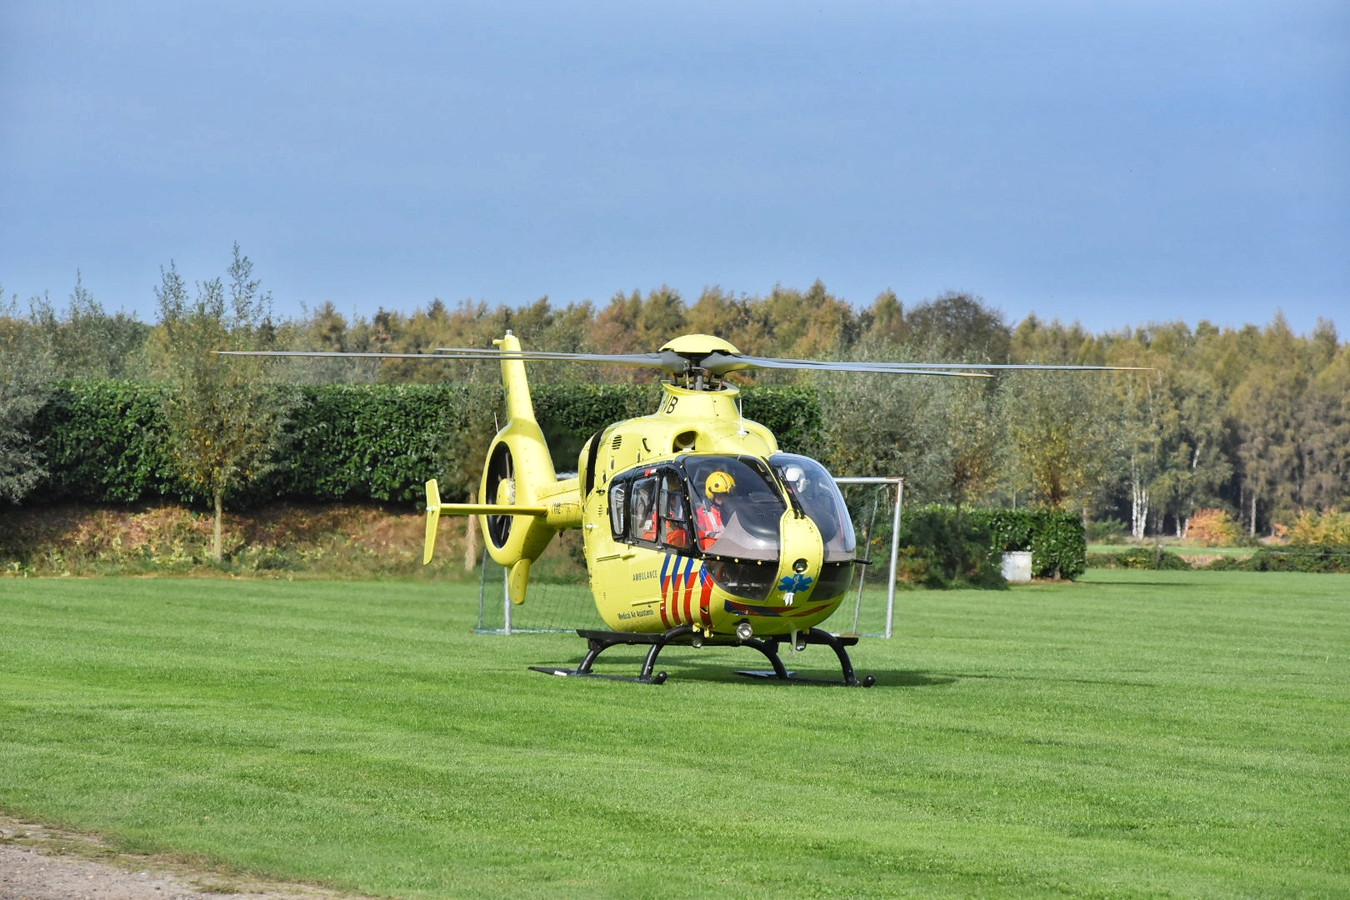 Traumahelikopter geland na incident met springkussen in Esbeek